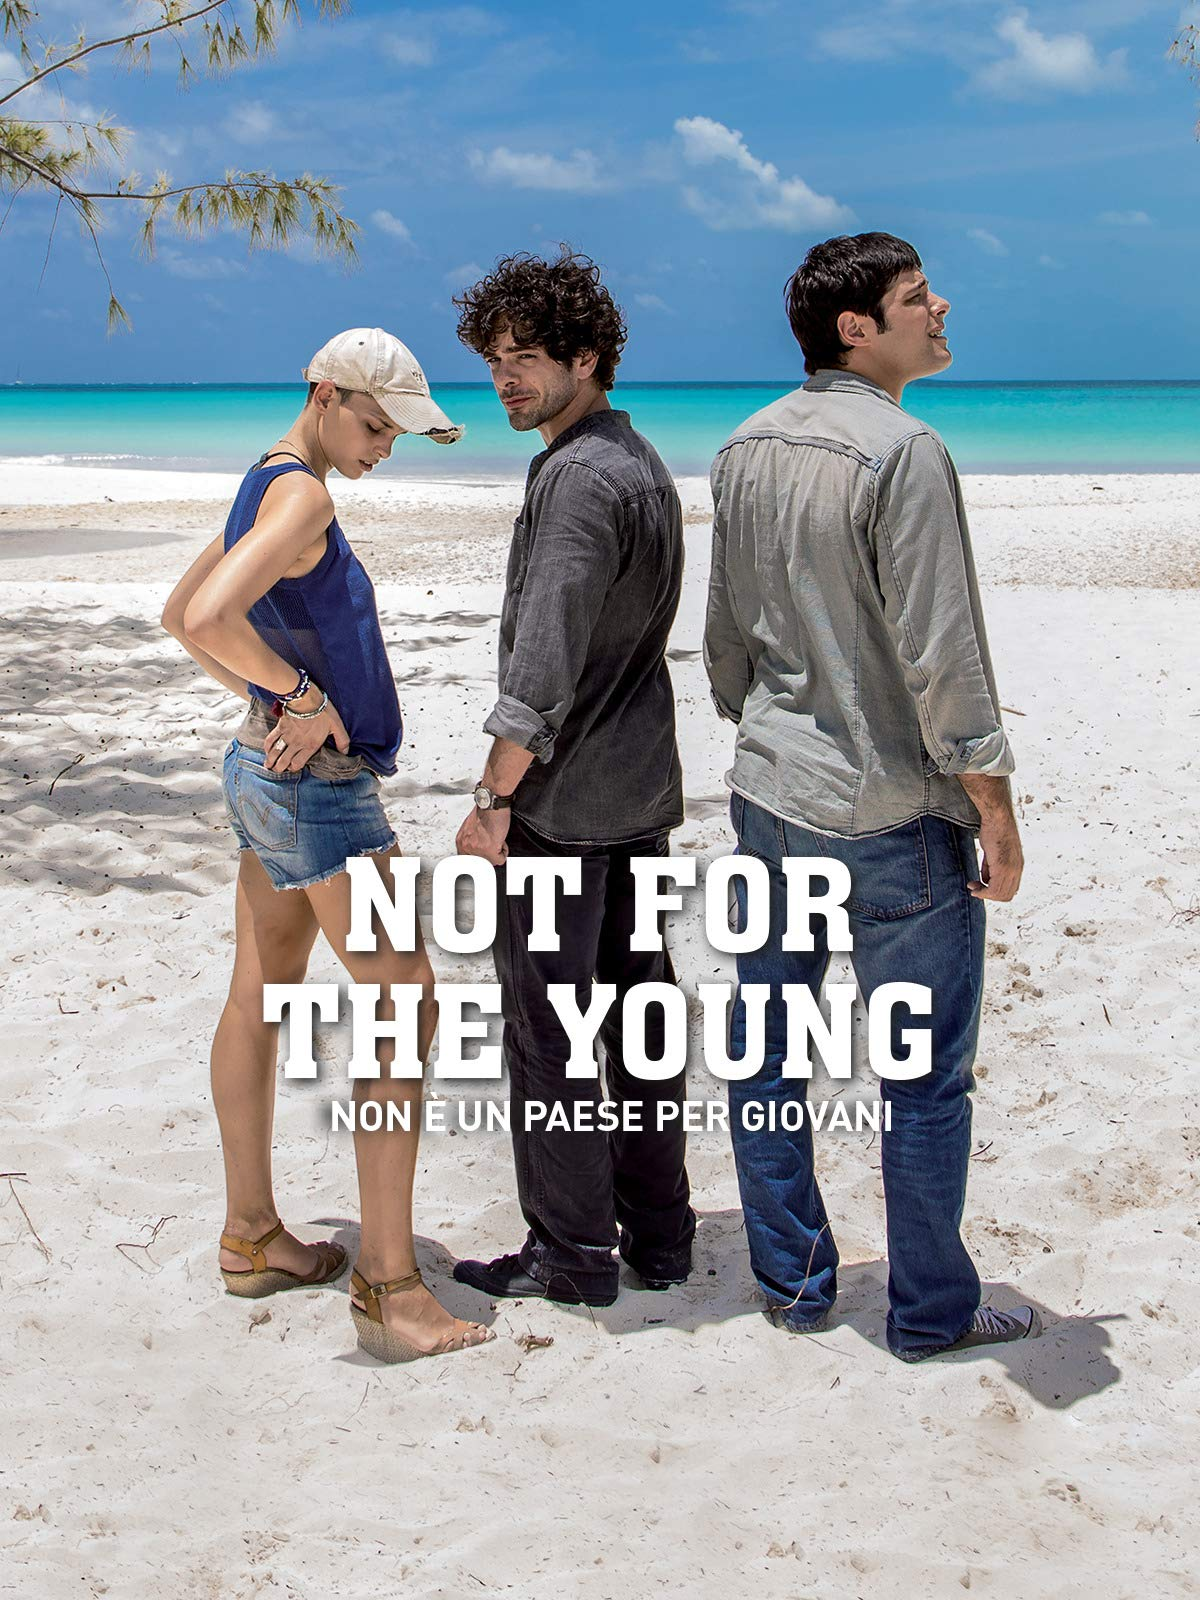 Not for the Young - Non è un paese per giovani on Amazon Prime Video UK